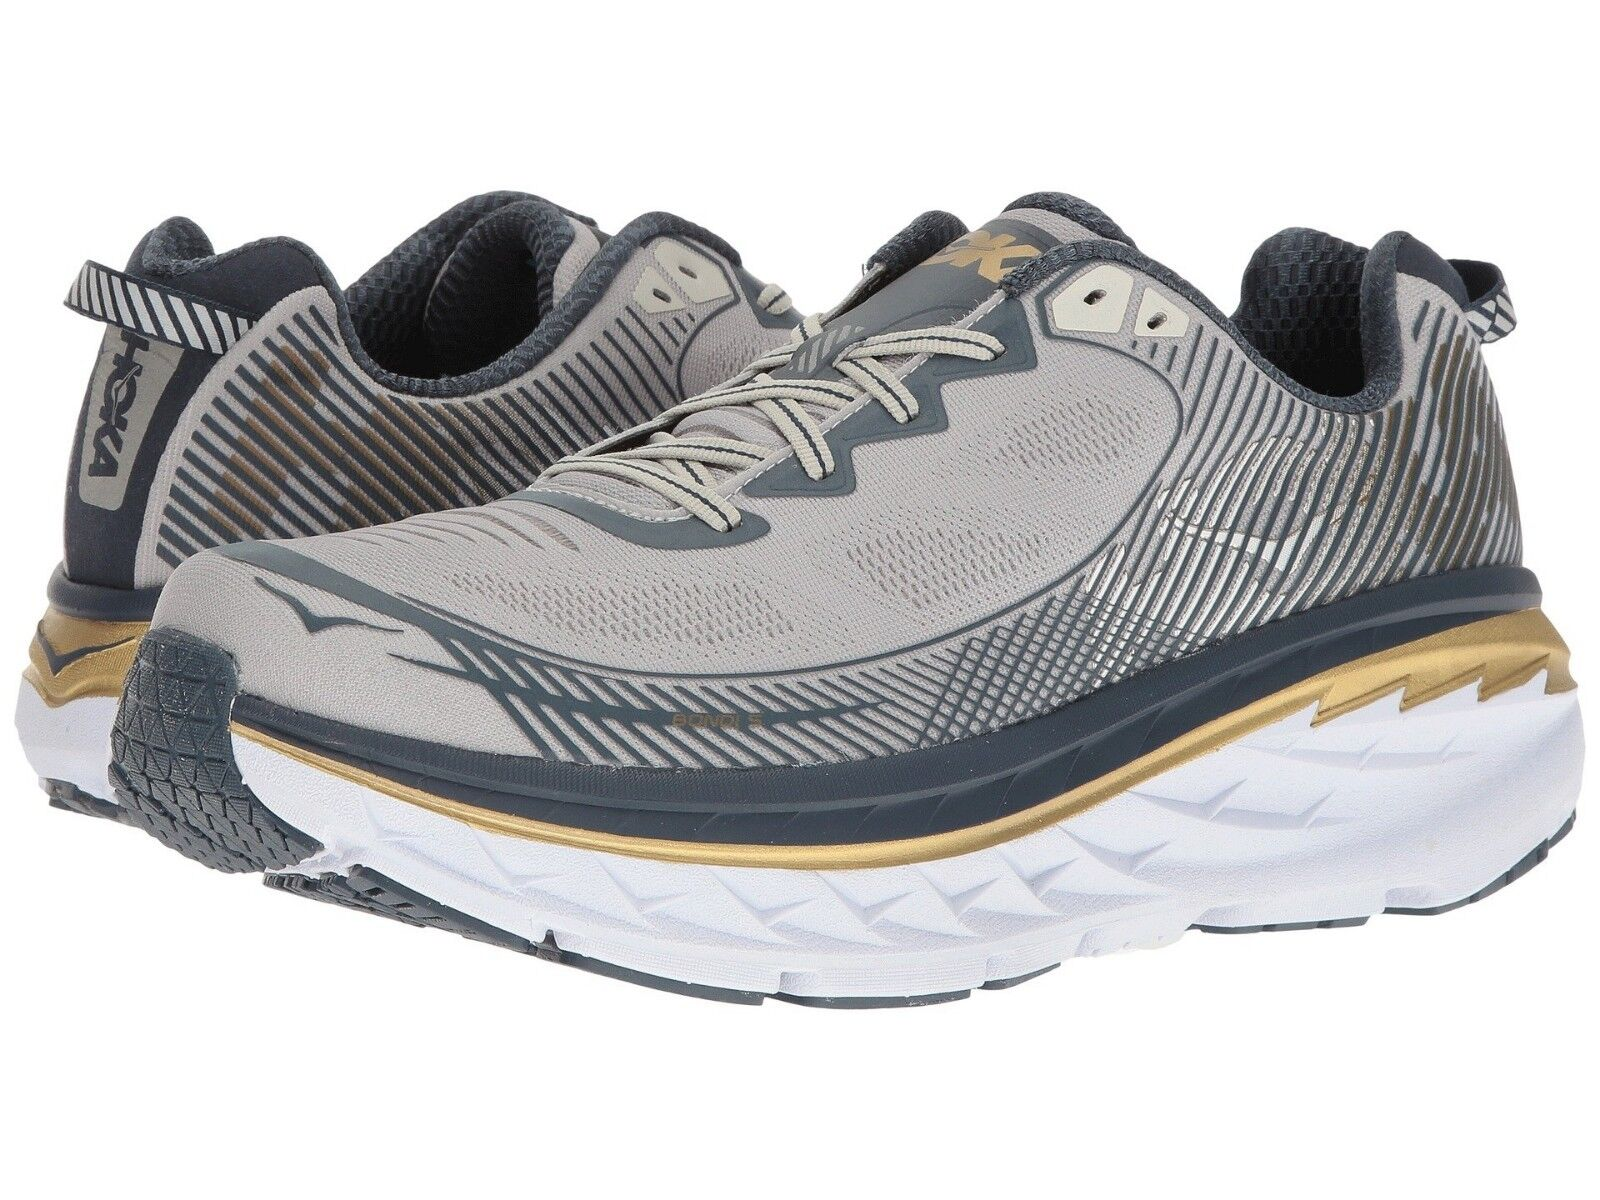 New Uomo Hoka One One Bondi 5 Running scarpe scarpe scarpe Dimensione 8-13 Last Pair 1014757 CGMN 548a6b